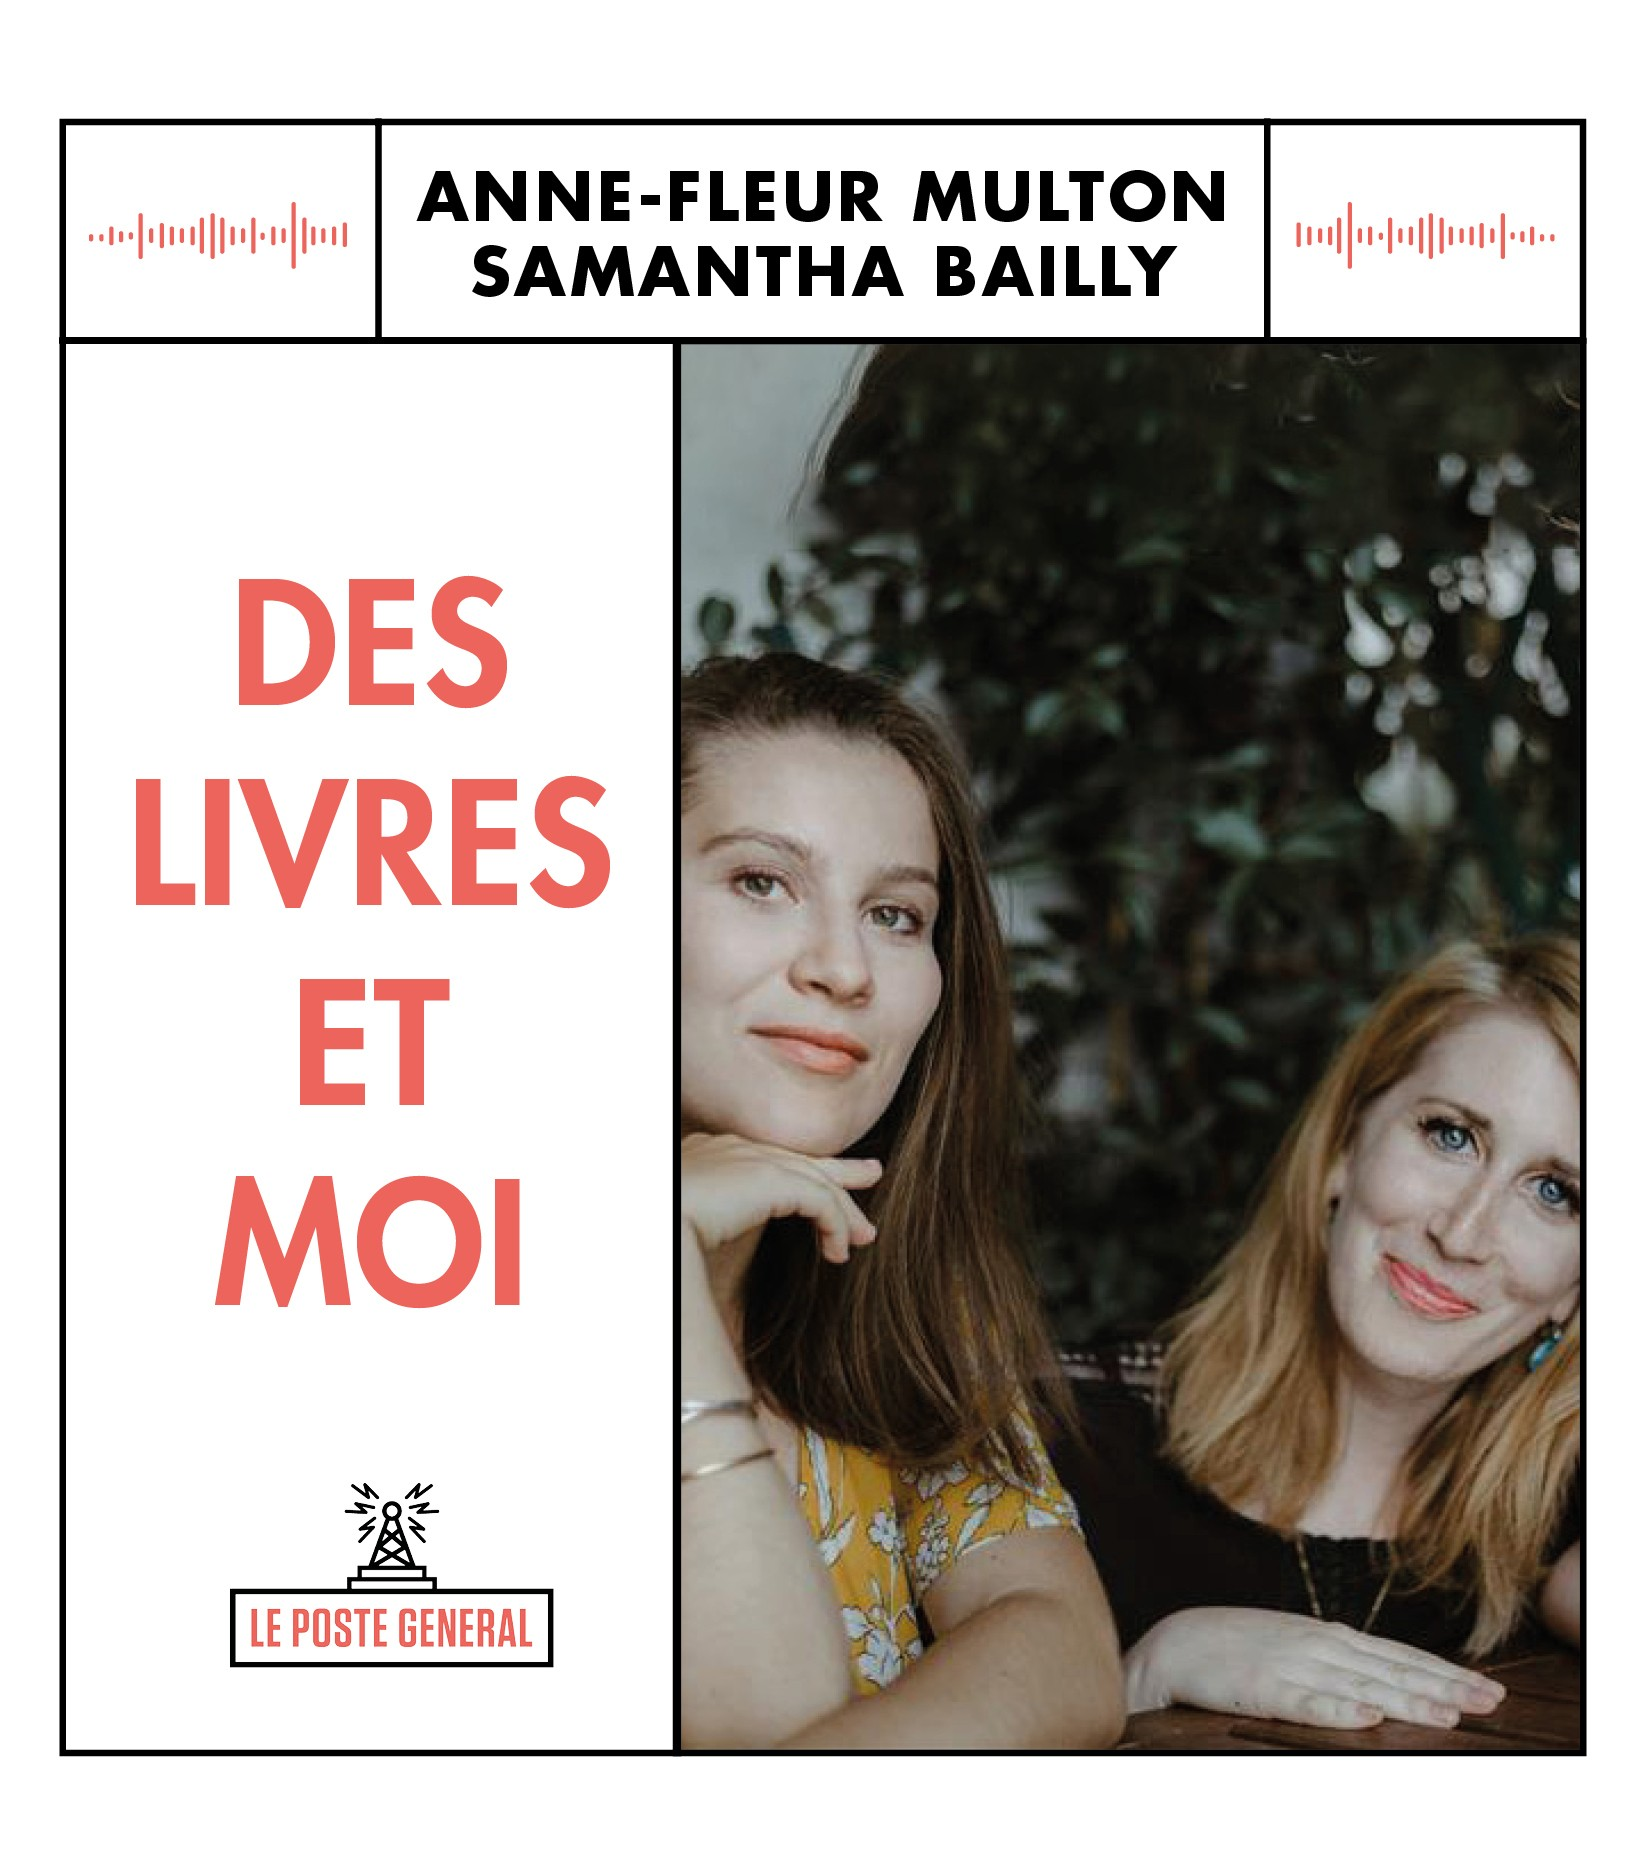 Anne-Fleur Multon et Samantha Bailly